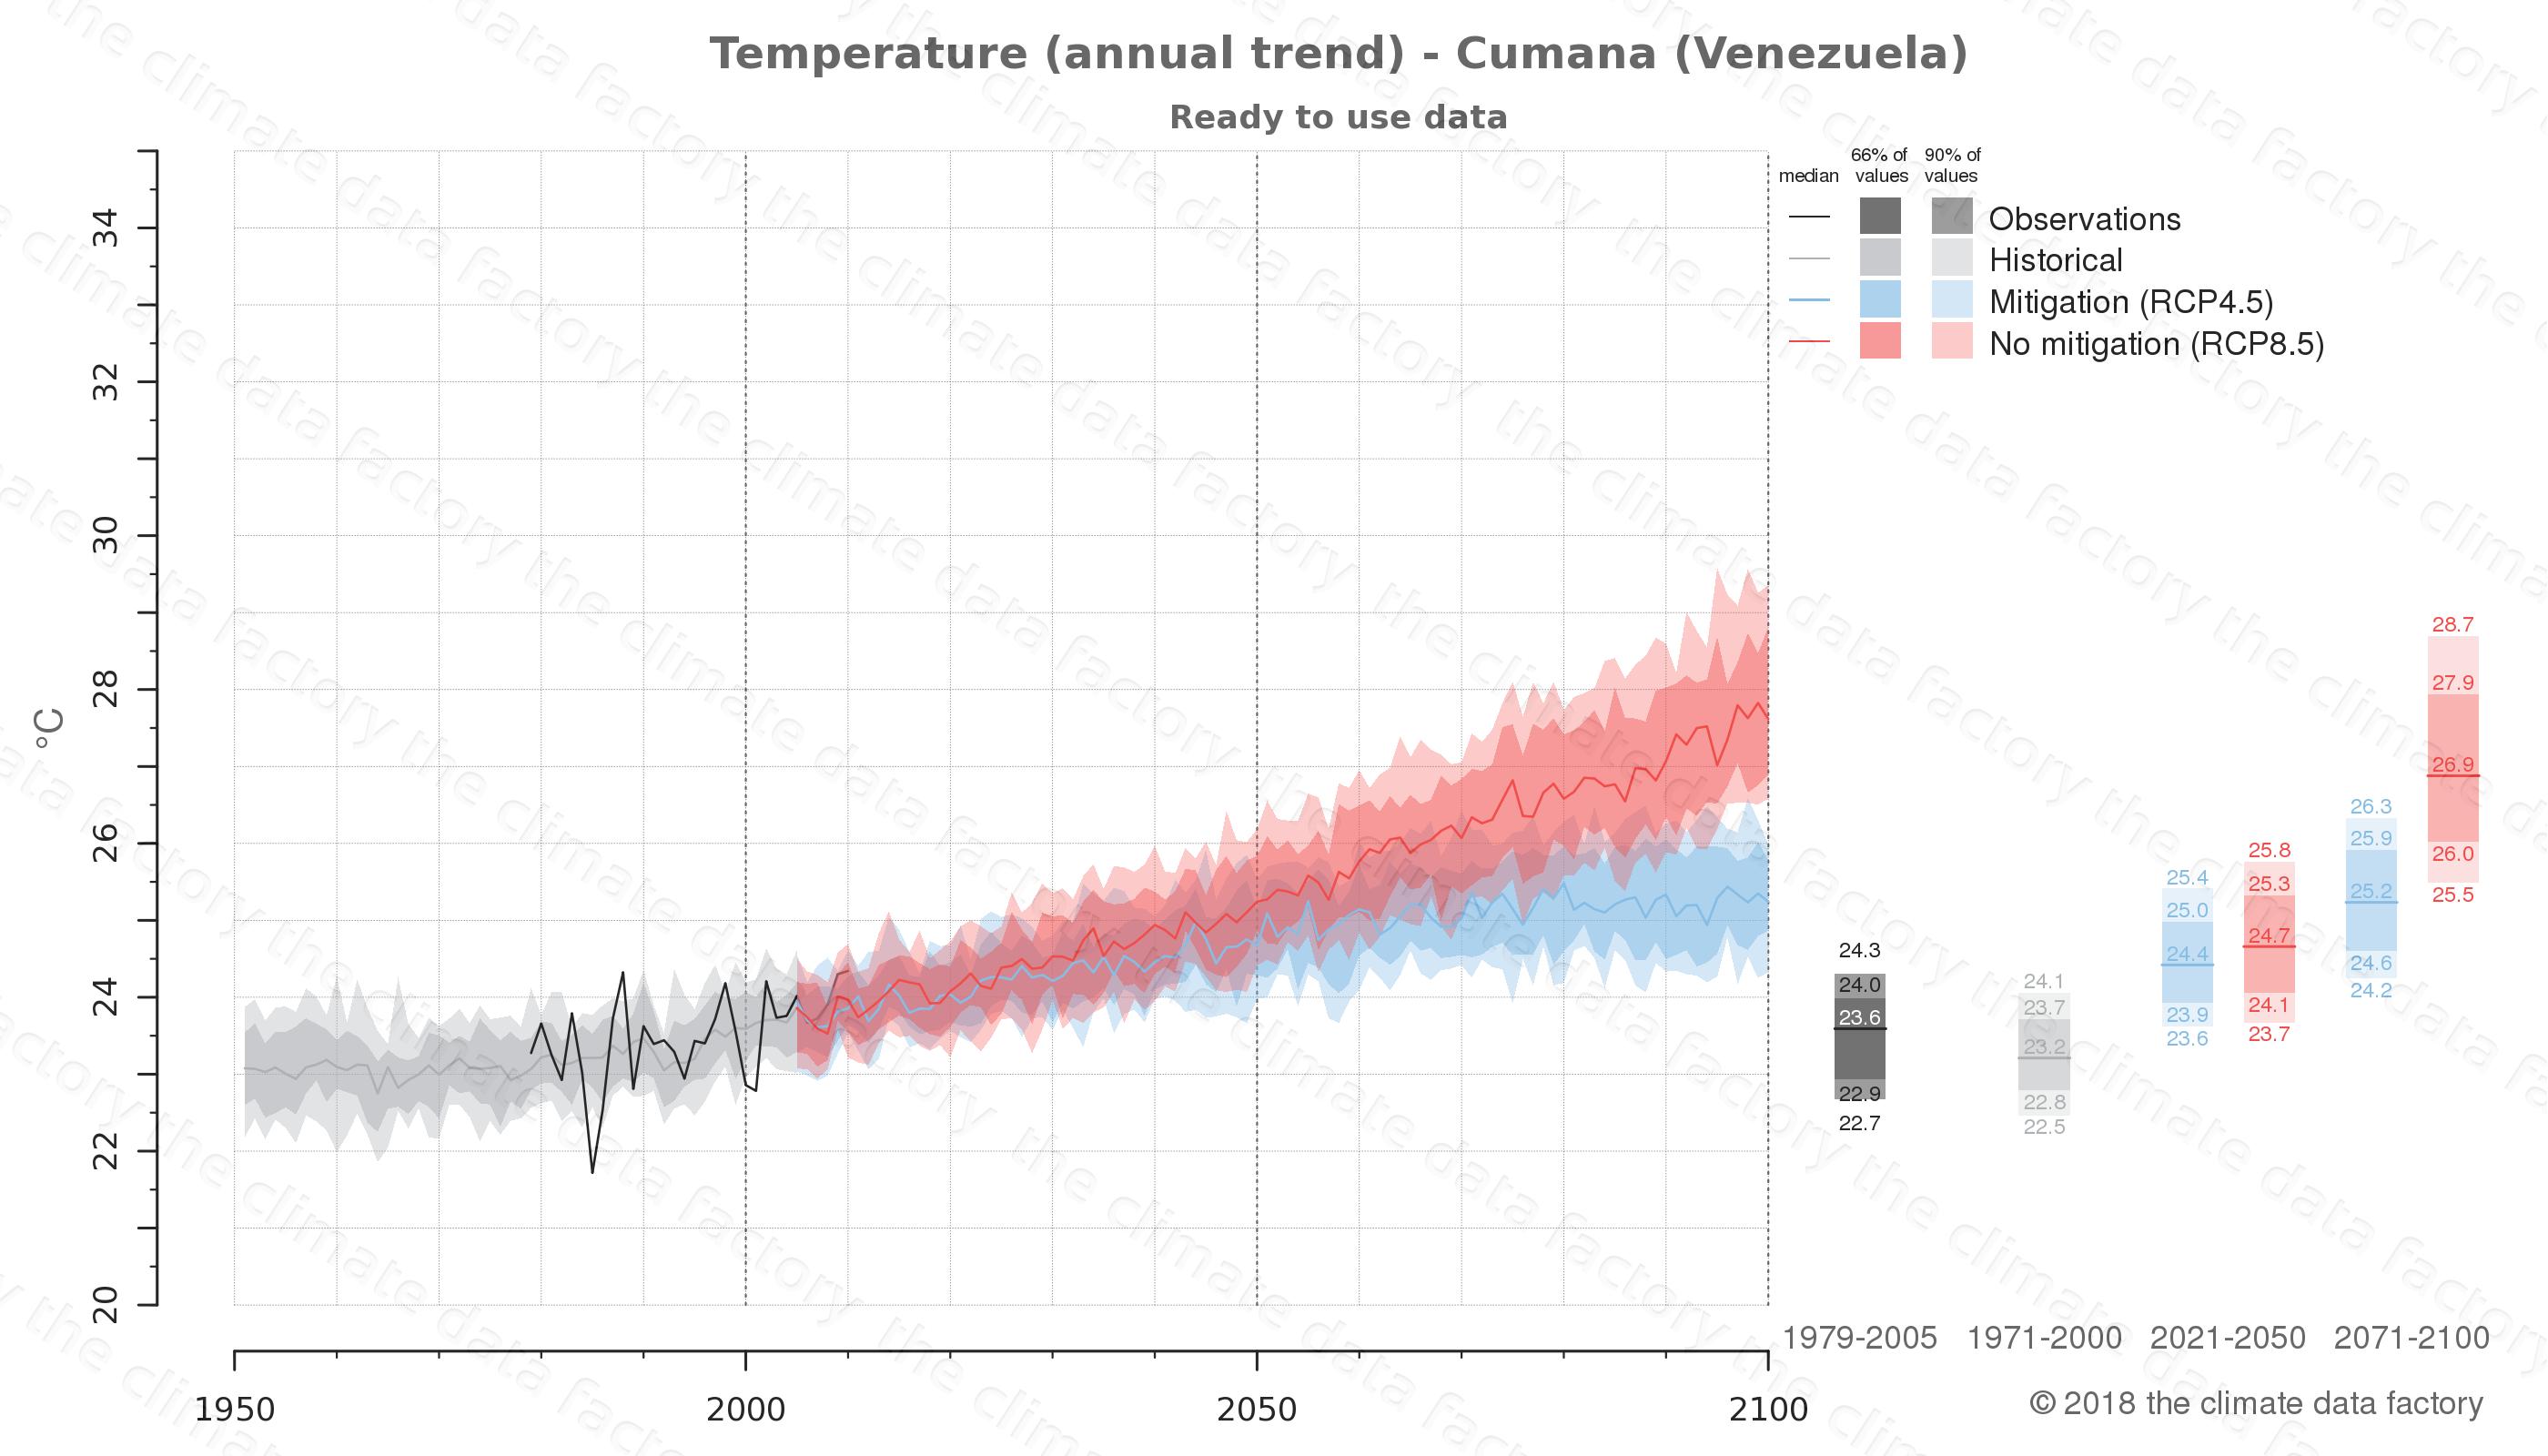 climate change data policy adaptation climate graph city data temperature cumana venezuela